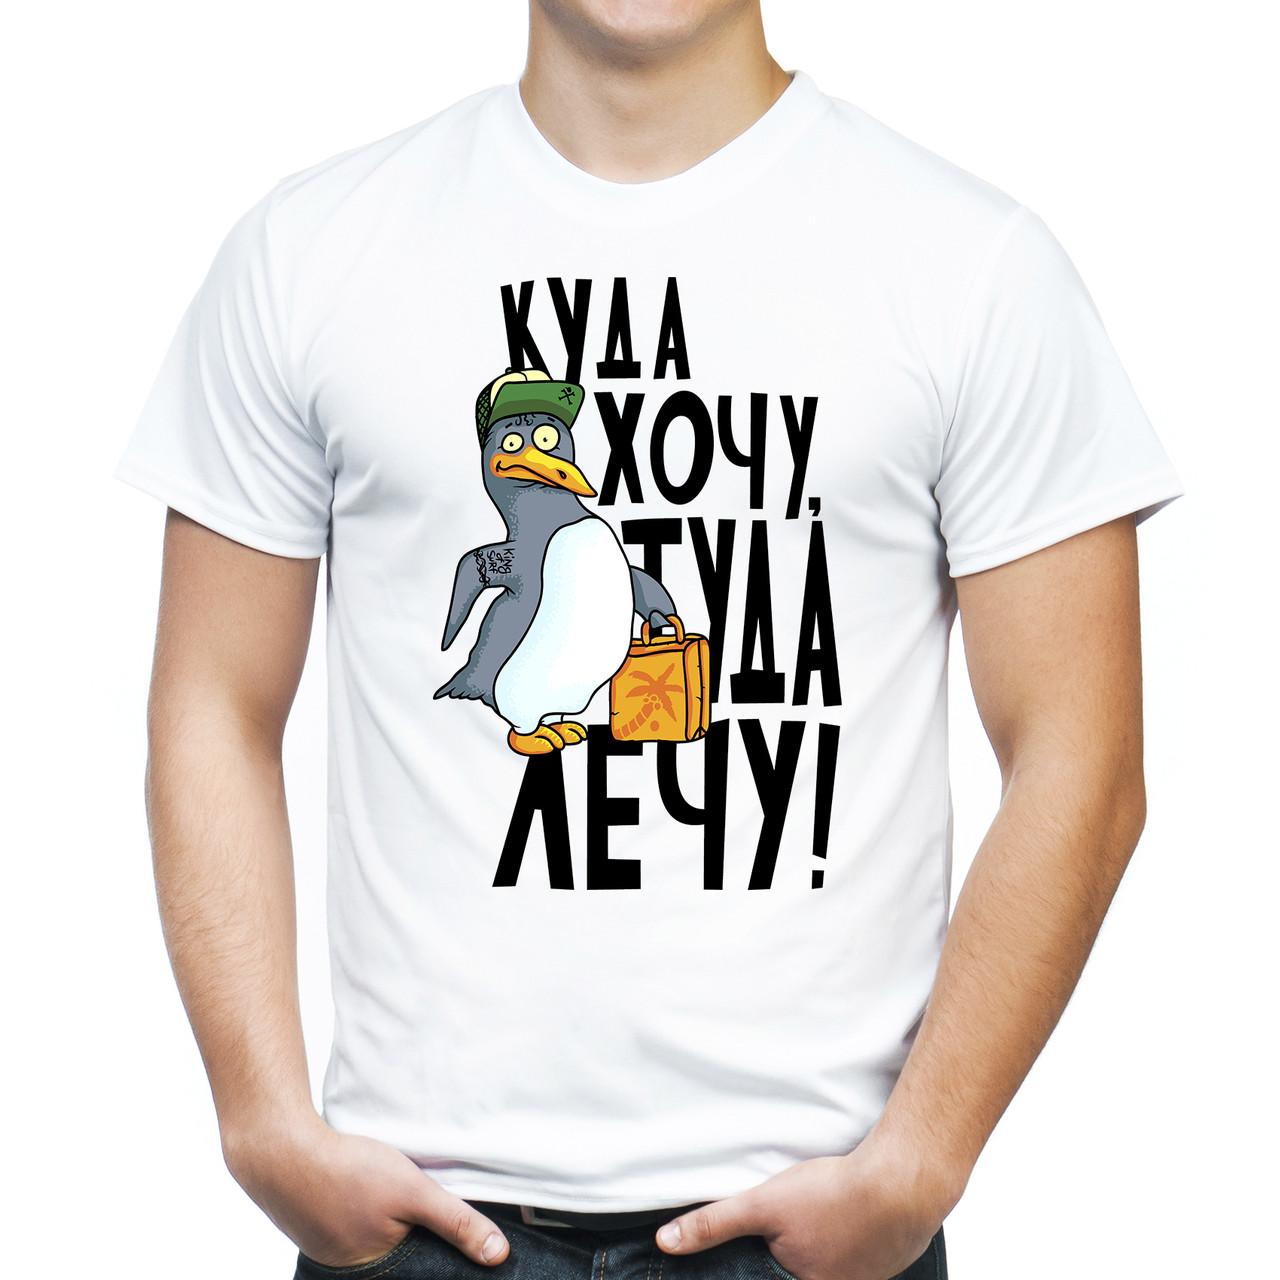 "Мужская футболка ""Куда хочу, туда лечу"""